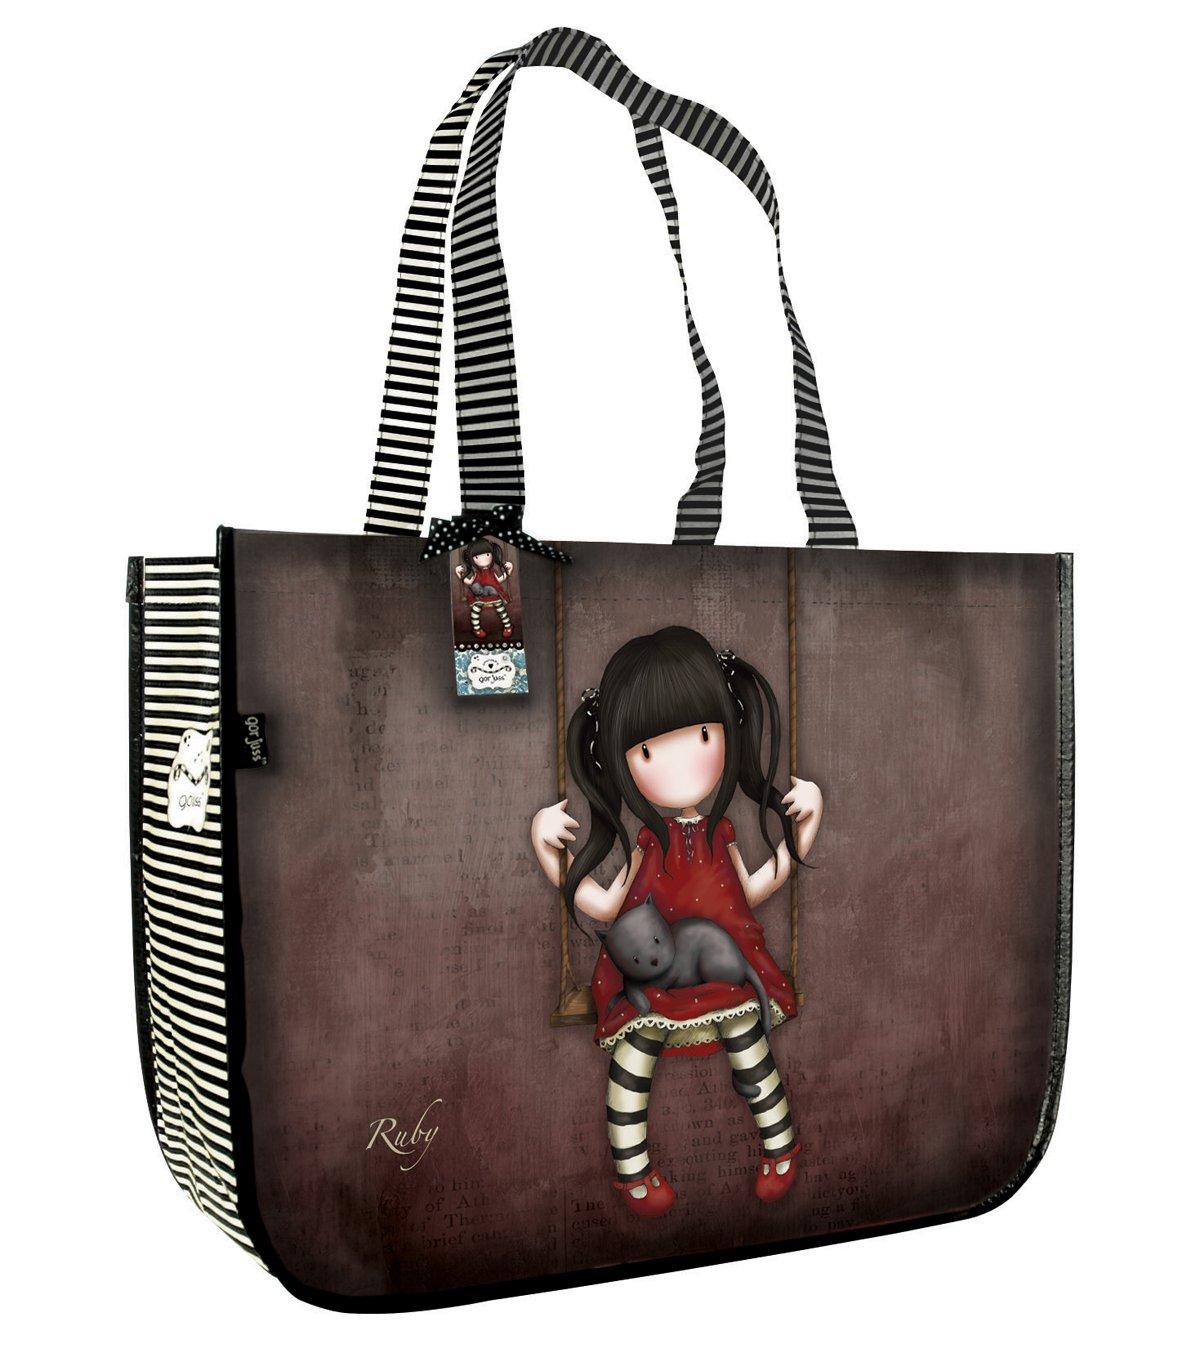 Amazon.com: Santoro Gorjuss Shopper bolsa bolso, Ruby ...